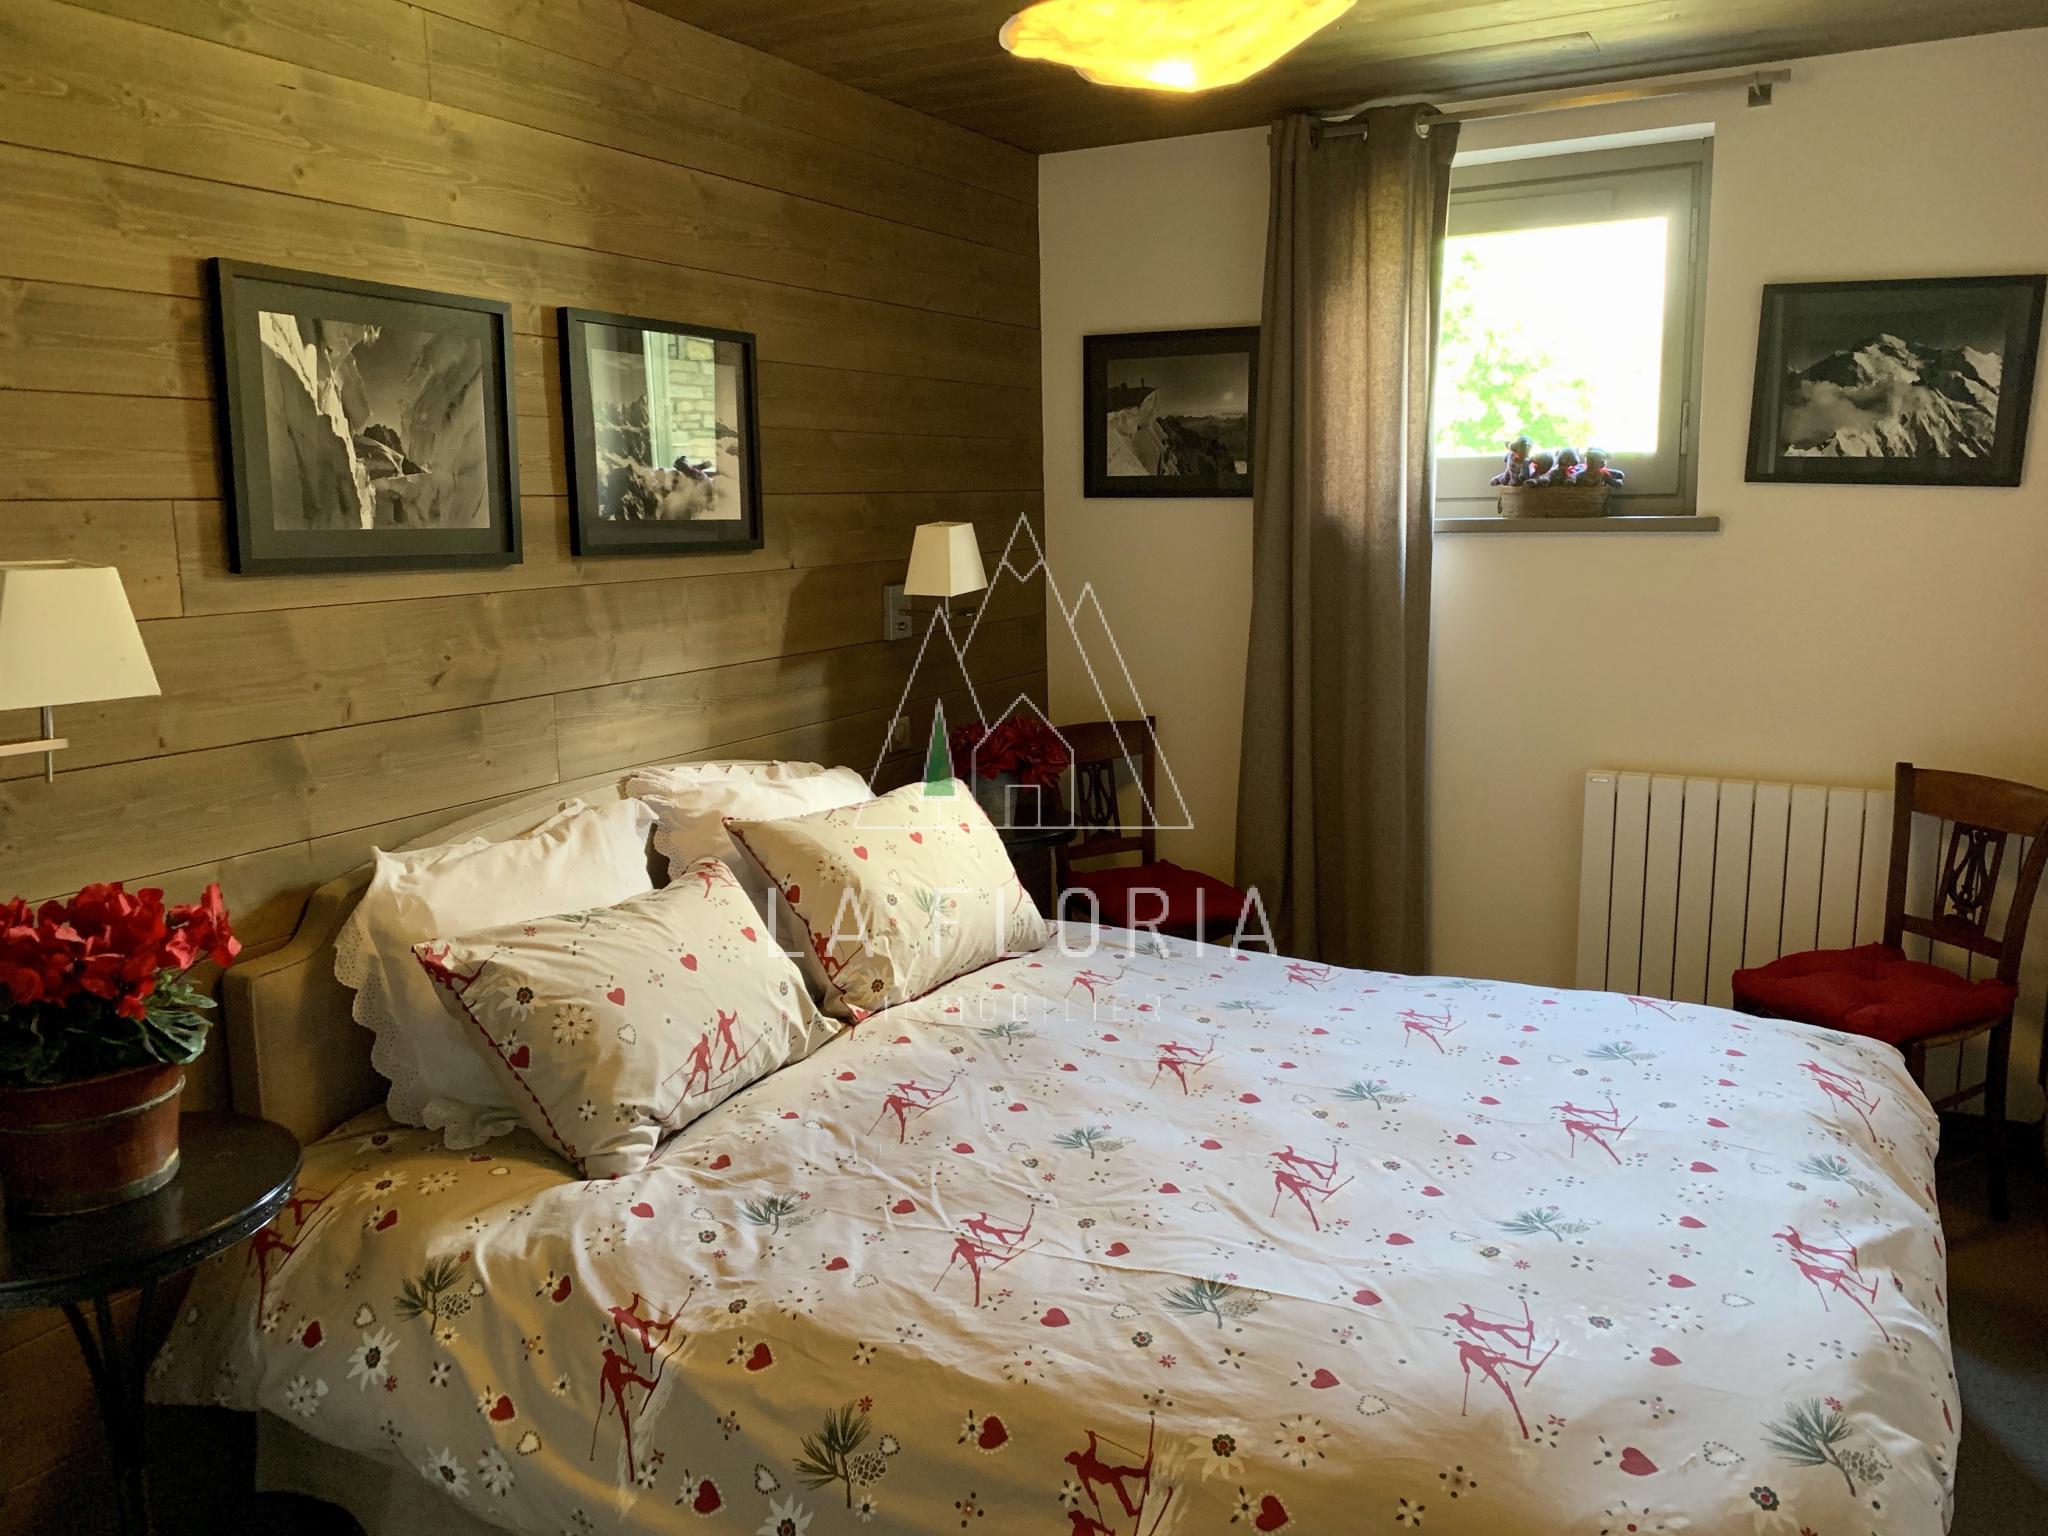 3 BED / 2 BATH TOP FLOOR DUPLEX APARTMENT 110 m2, CHAMONIX LES PRAZ